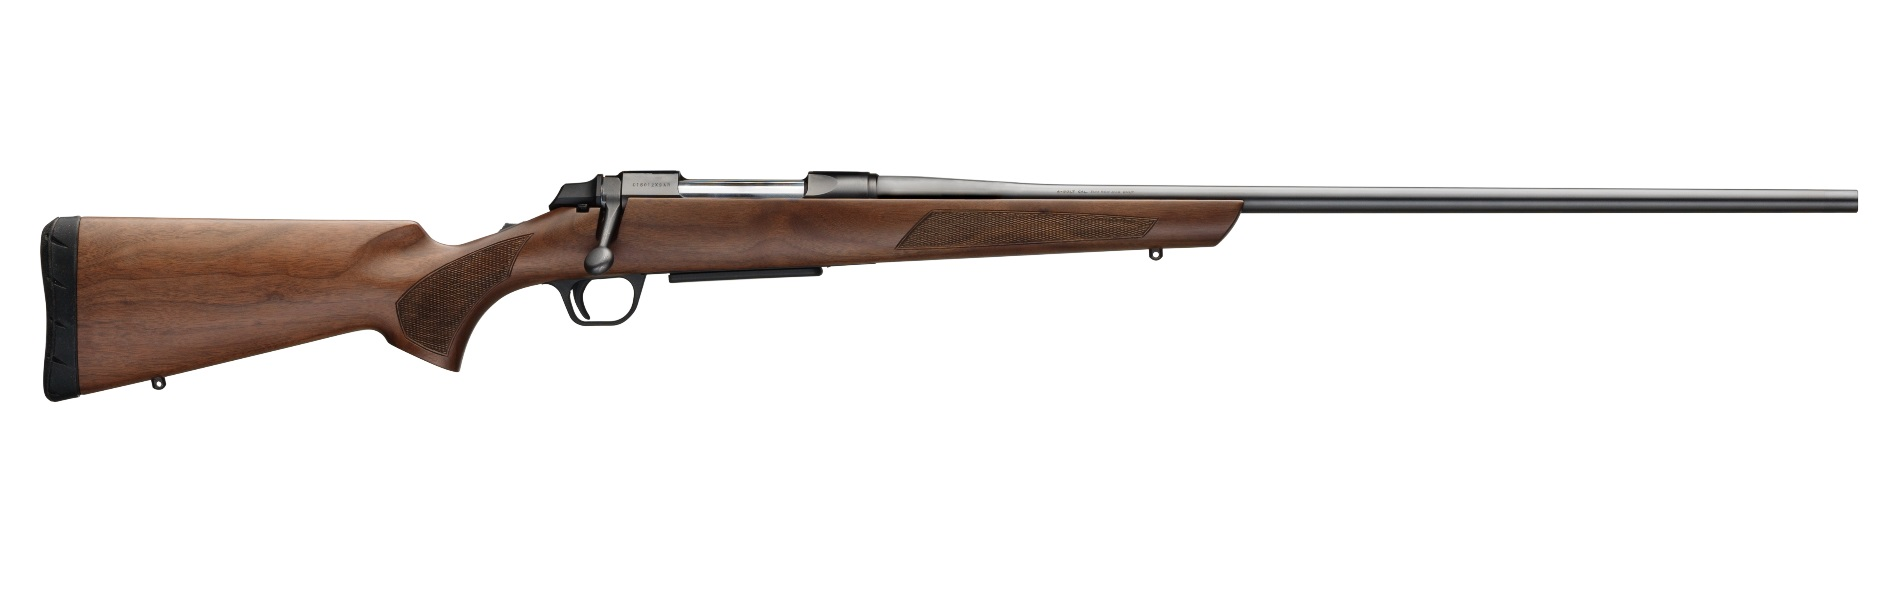 Browning A-Bolt III Hunter 7mm Rem Mag